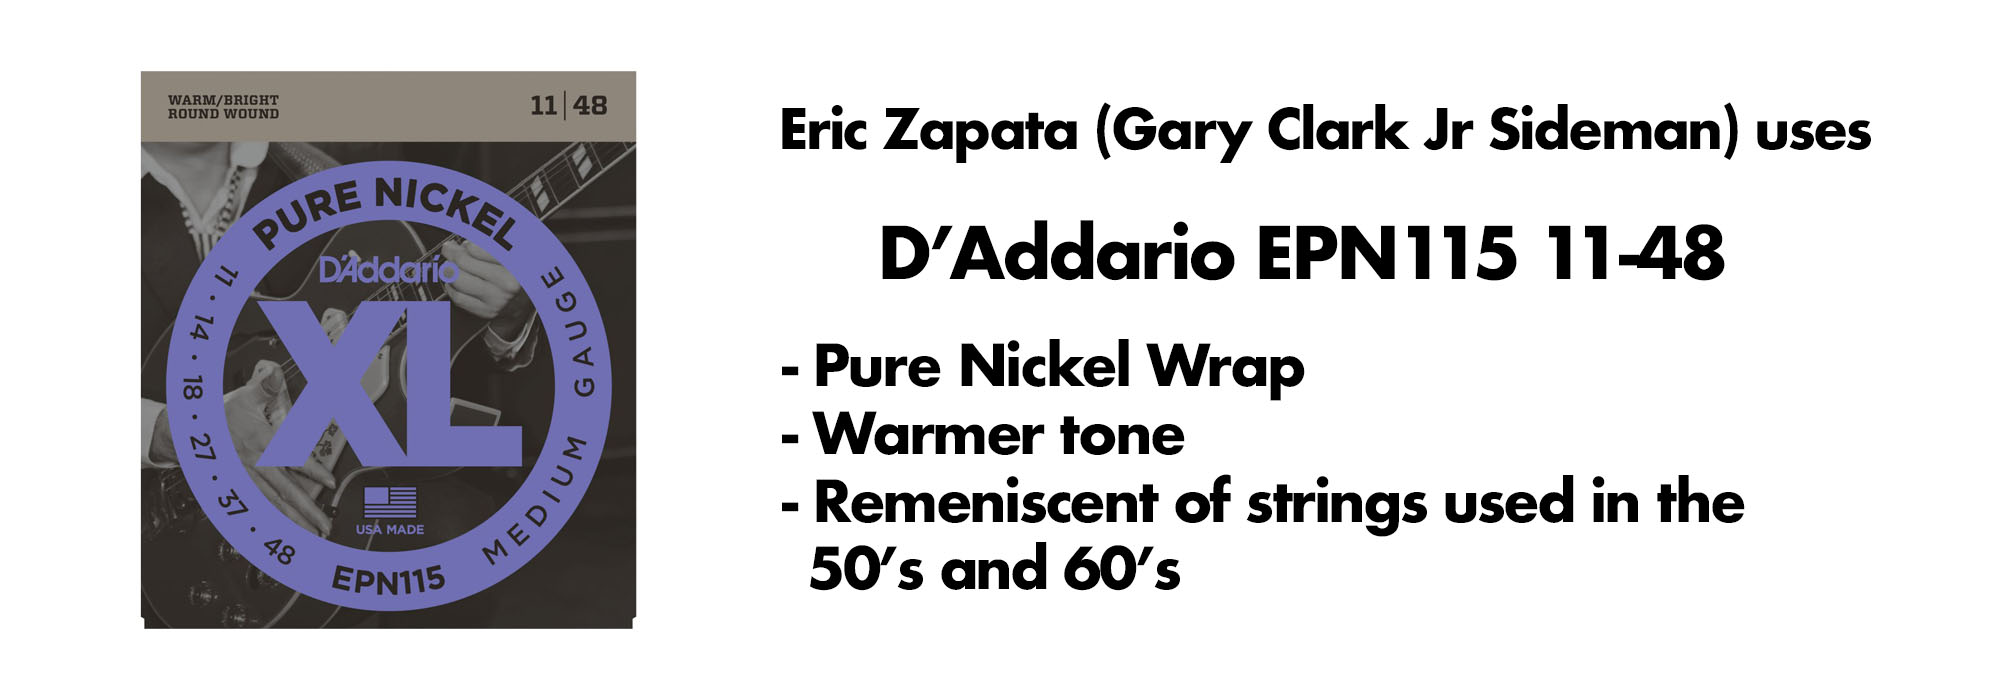 Eric Zapata uses EPN115